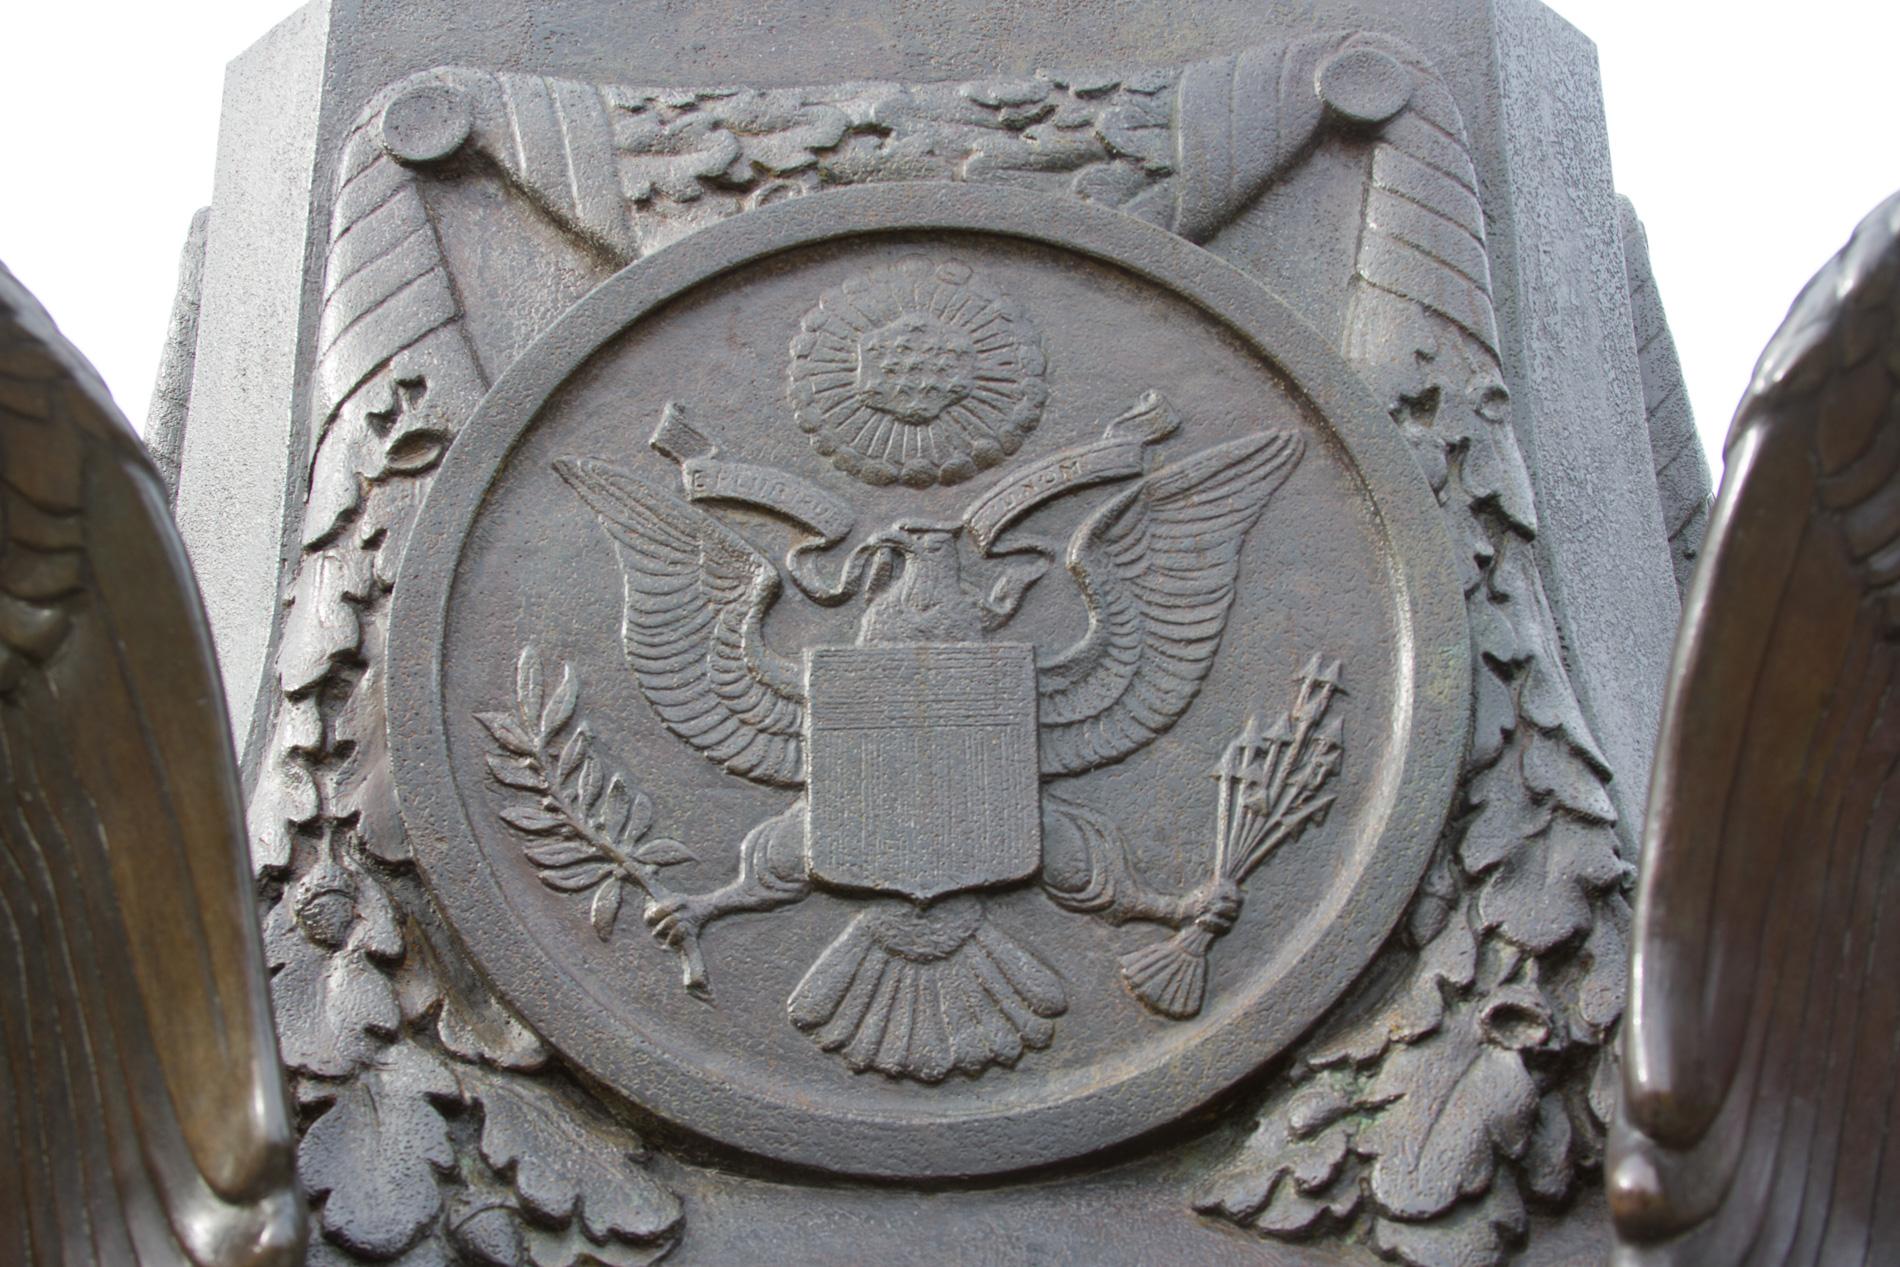 City Employees Memorial [1505]